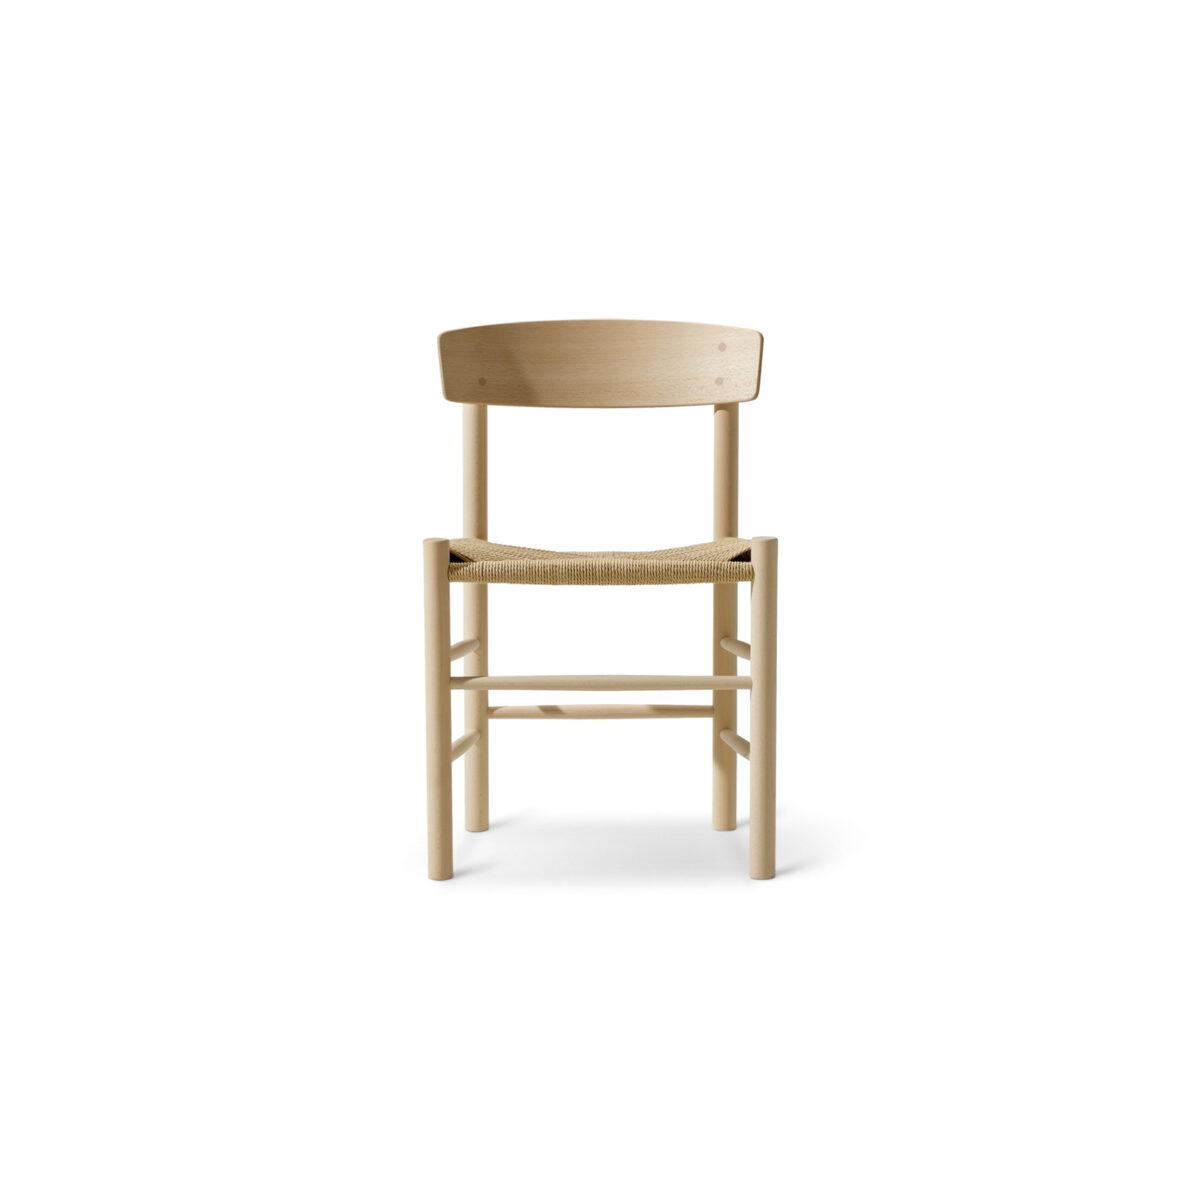 Fredericia j39 stol ek vitoljad natur Glashuset Malmo